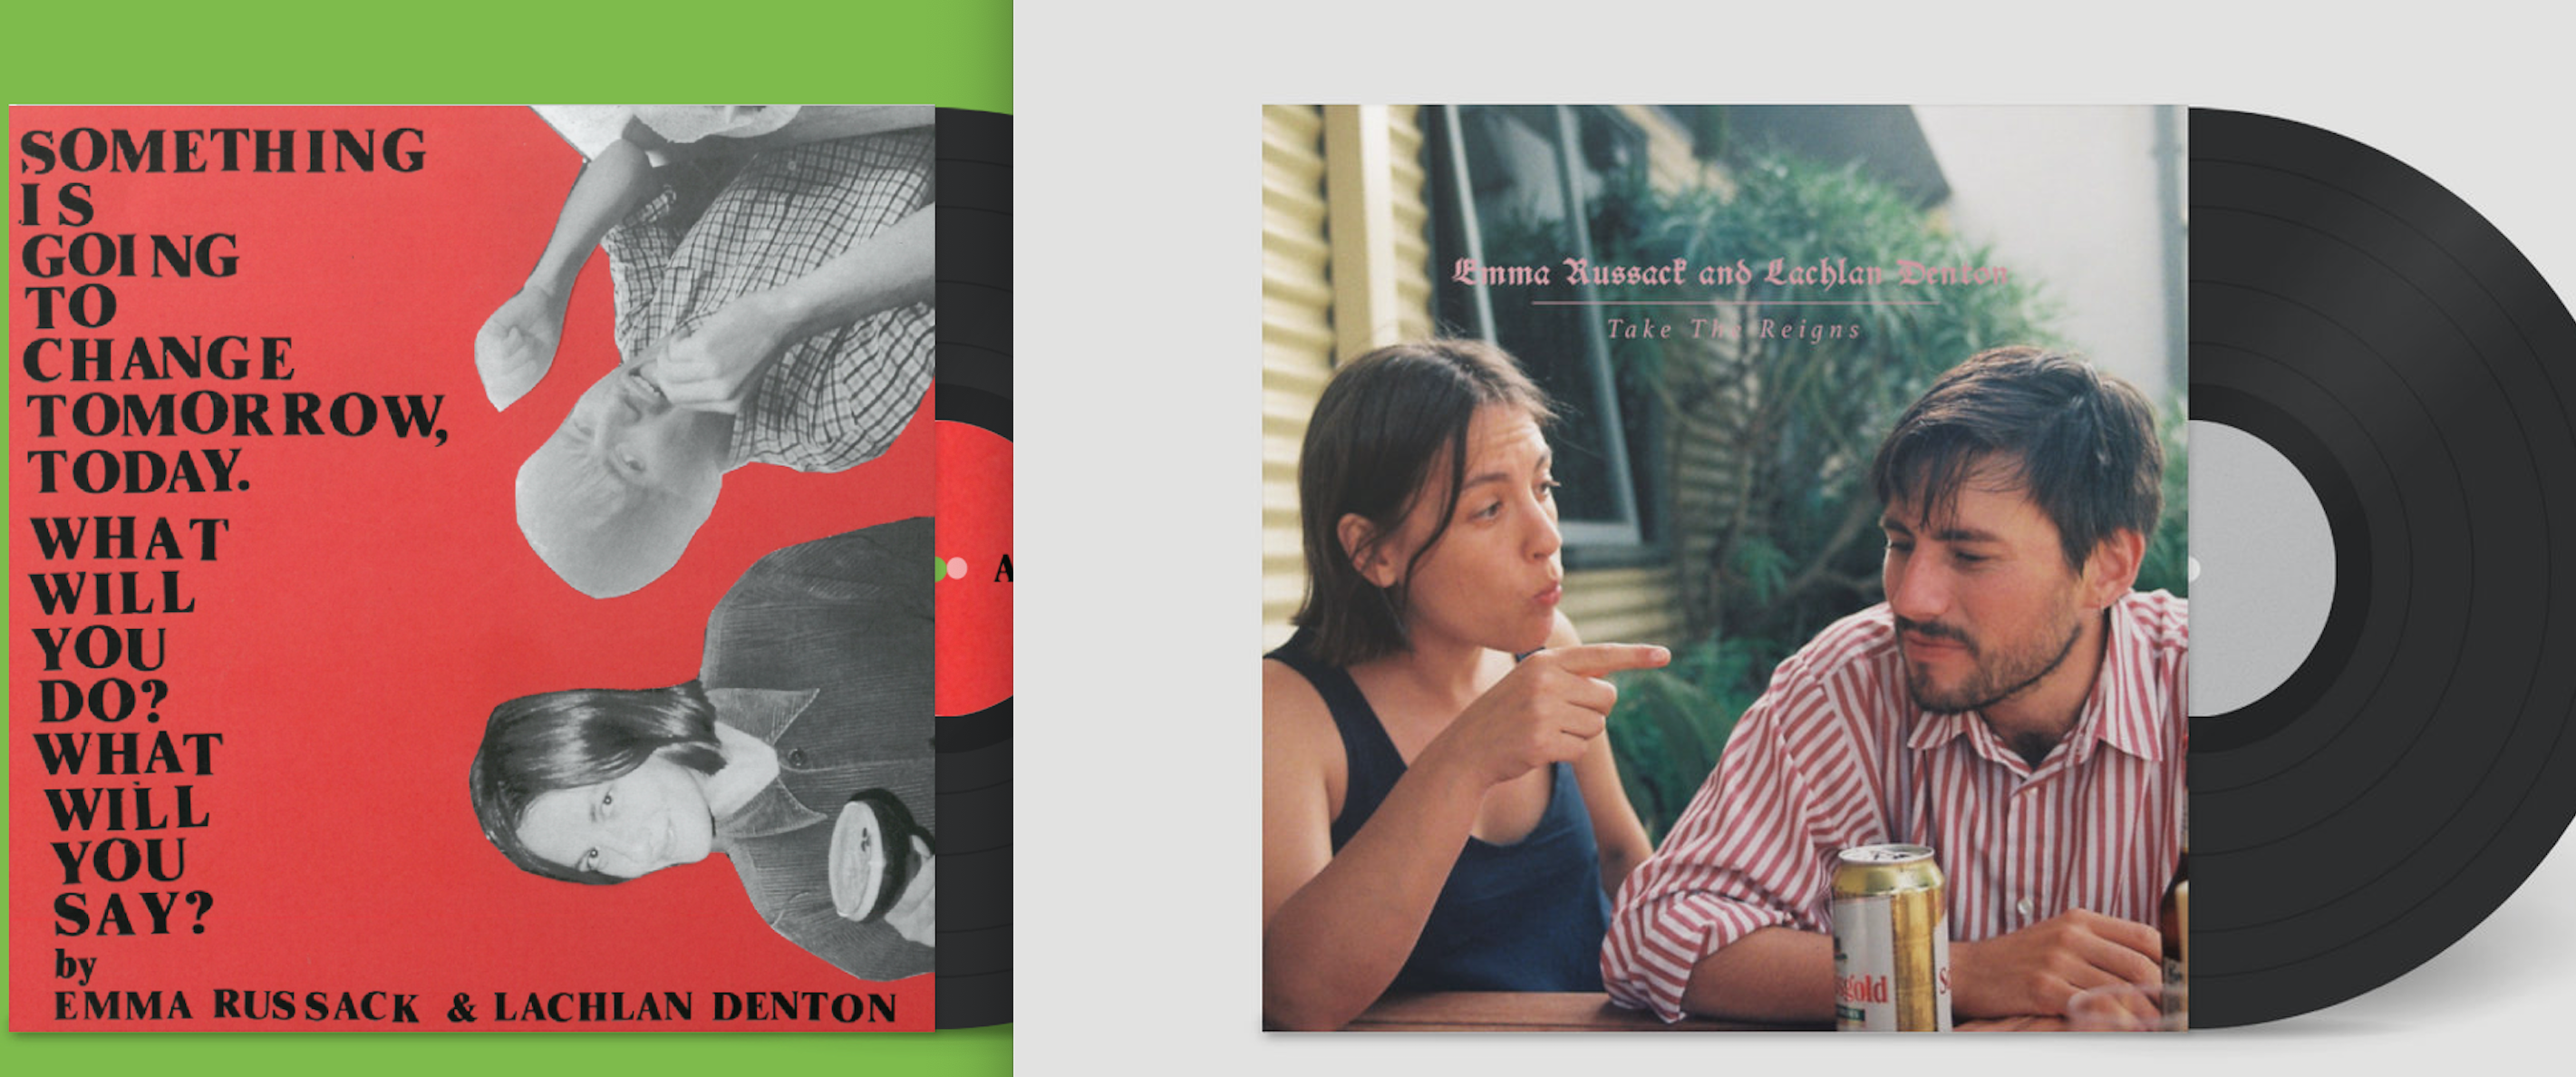 Emma Russack & Lachlan Denton 2x LP